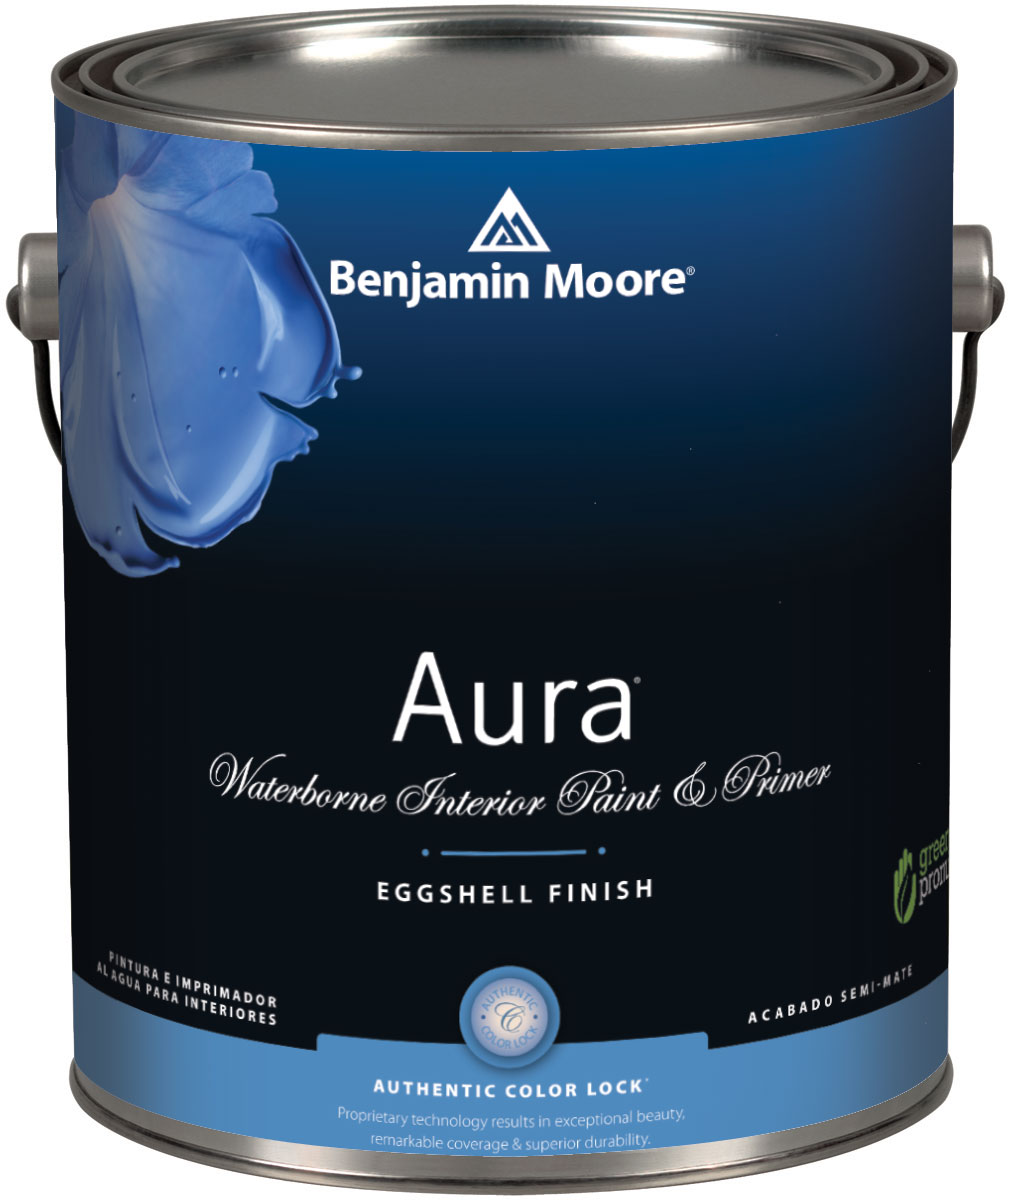 Benjamin Moore Aura Eggshell